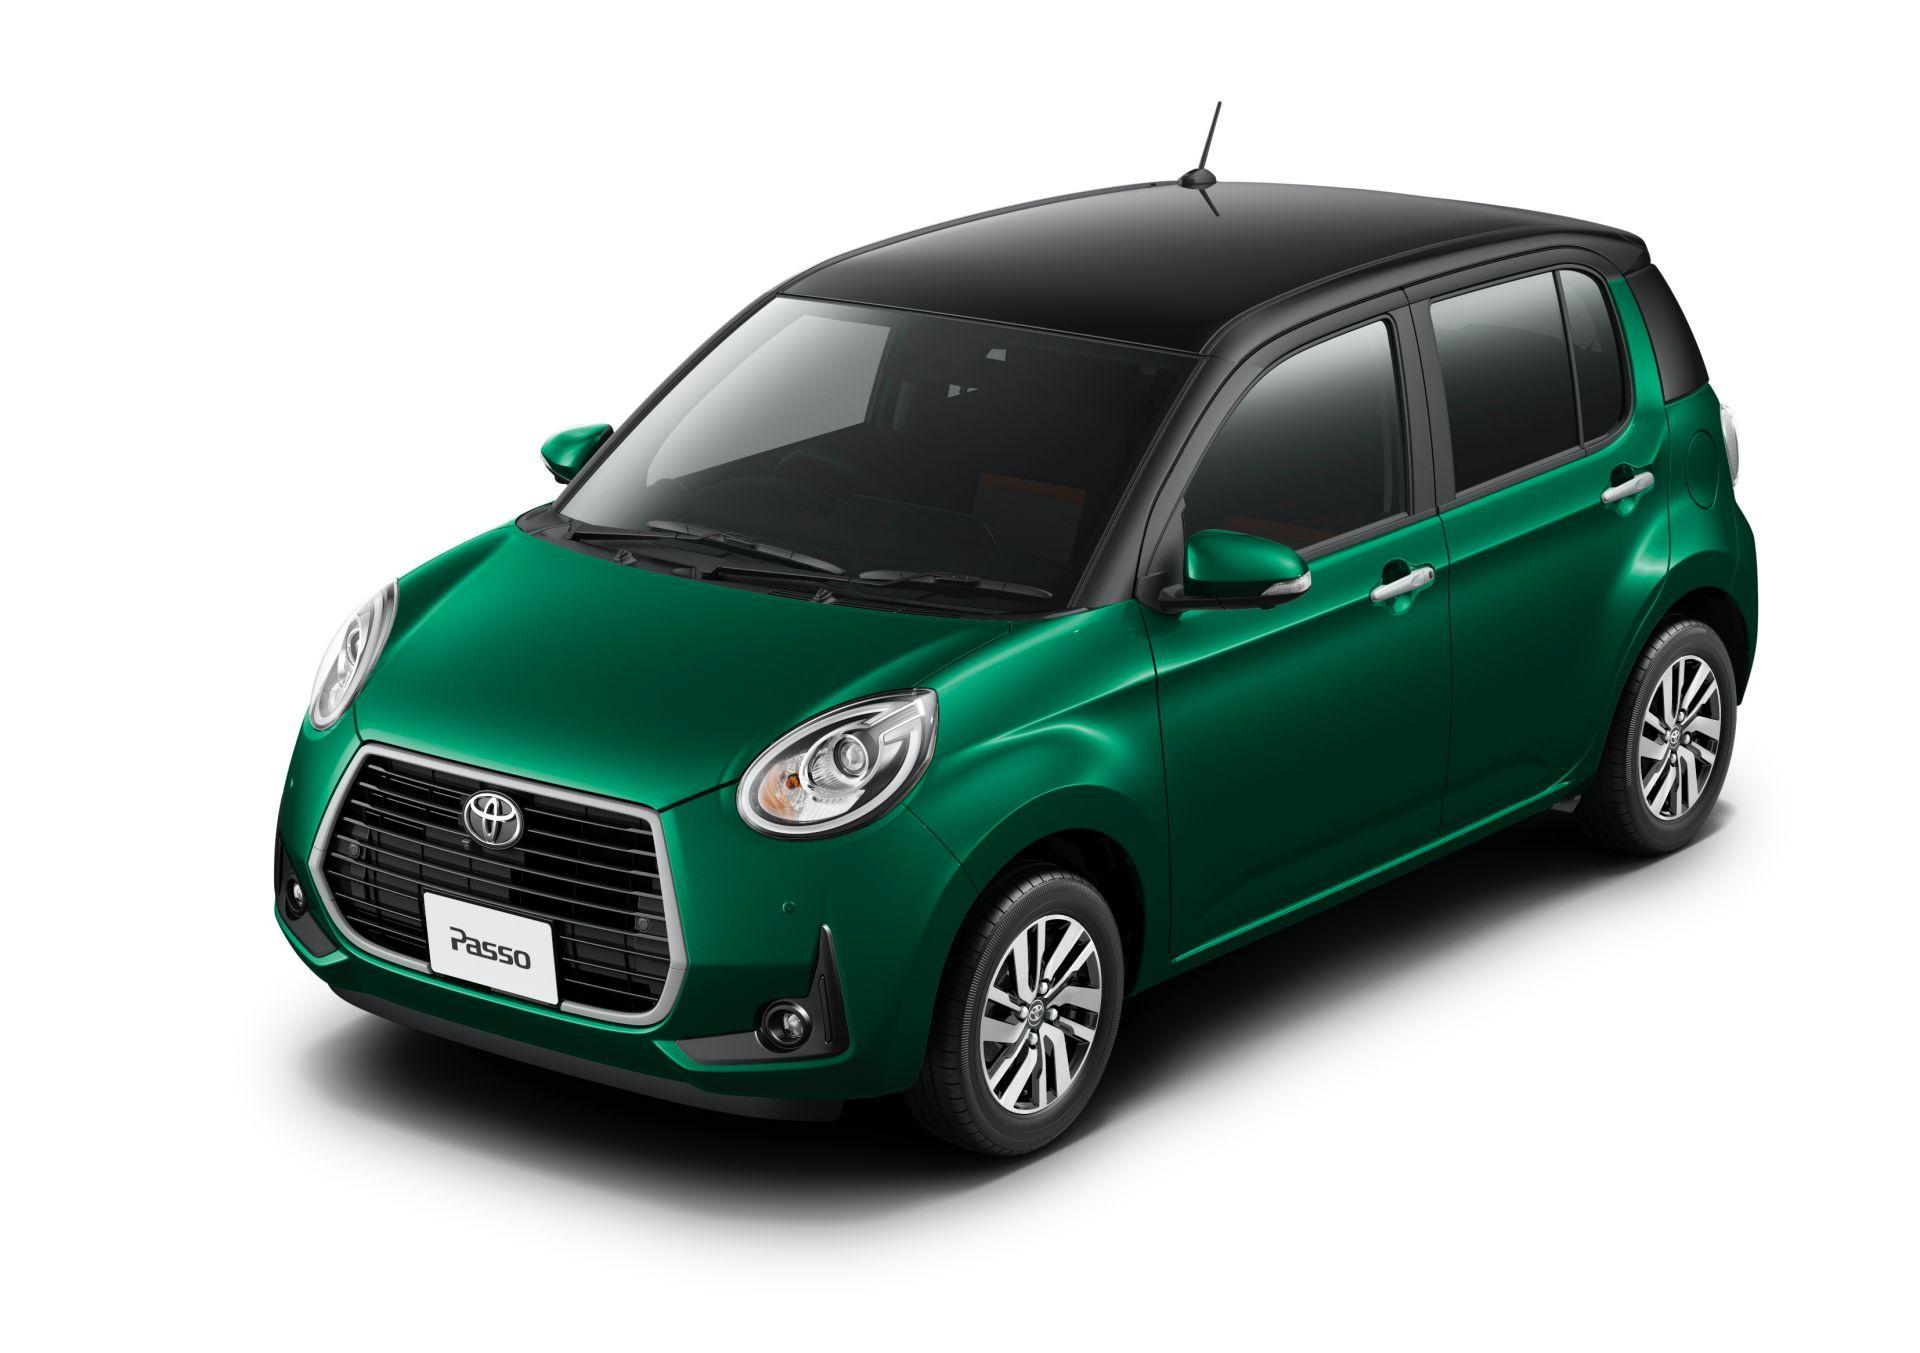 Toyota_Passo_Moda_Charm_0008